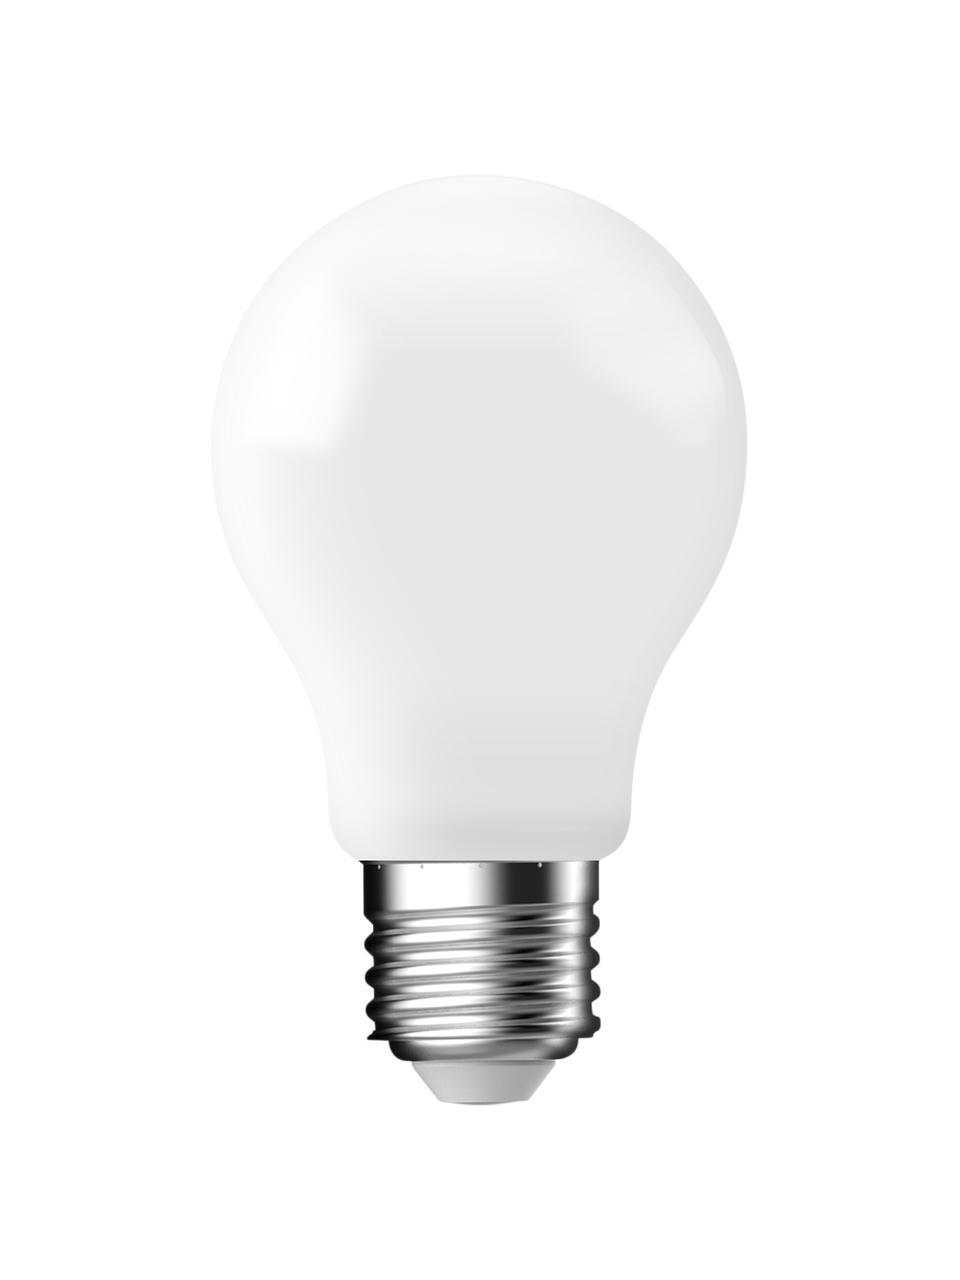 E27 lampadina, 4.6W, bianco caldo 6 pz, Lampadina: vetro, Bianco, Ø 6 x Alt. 10 cm